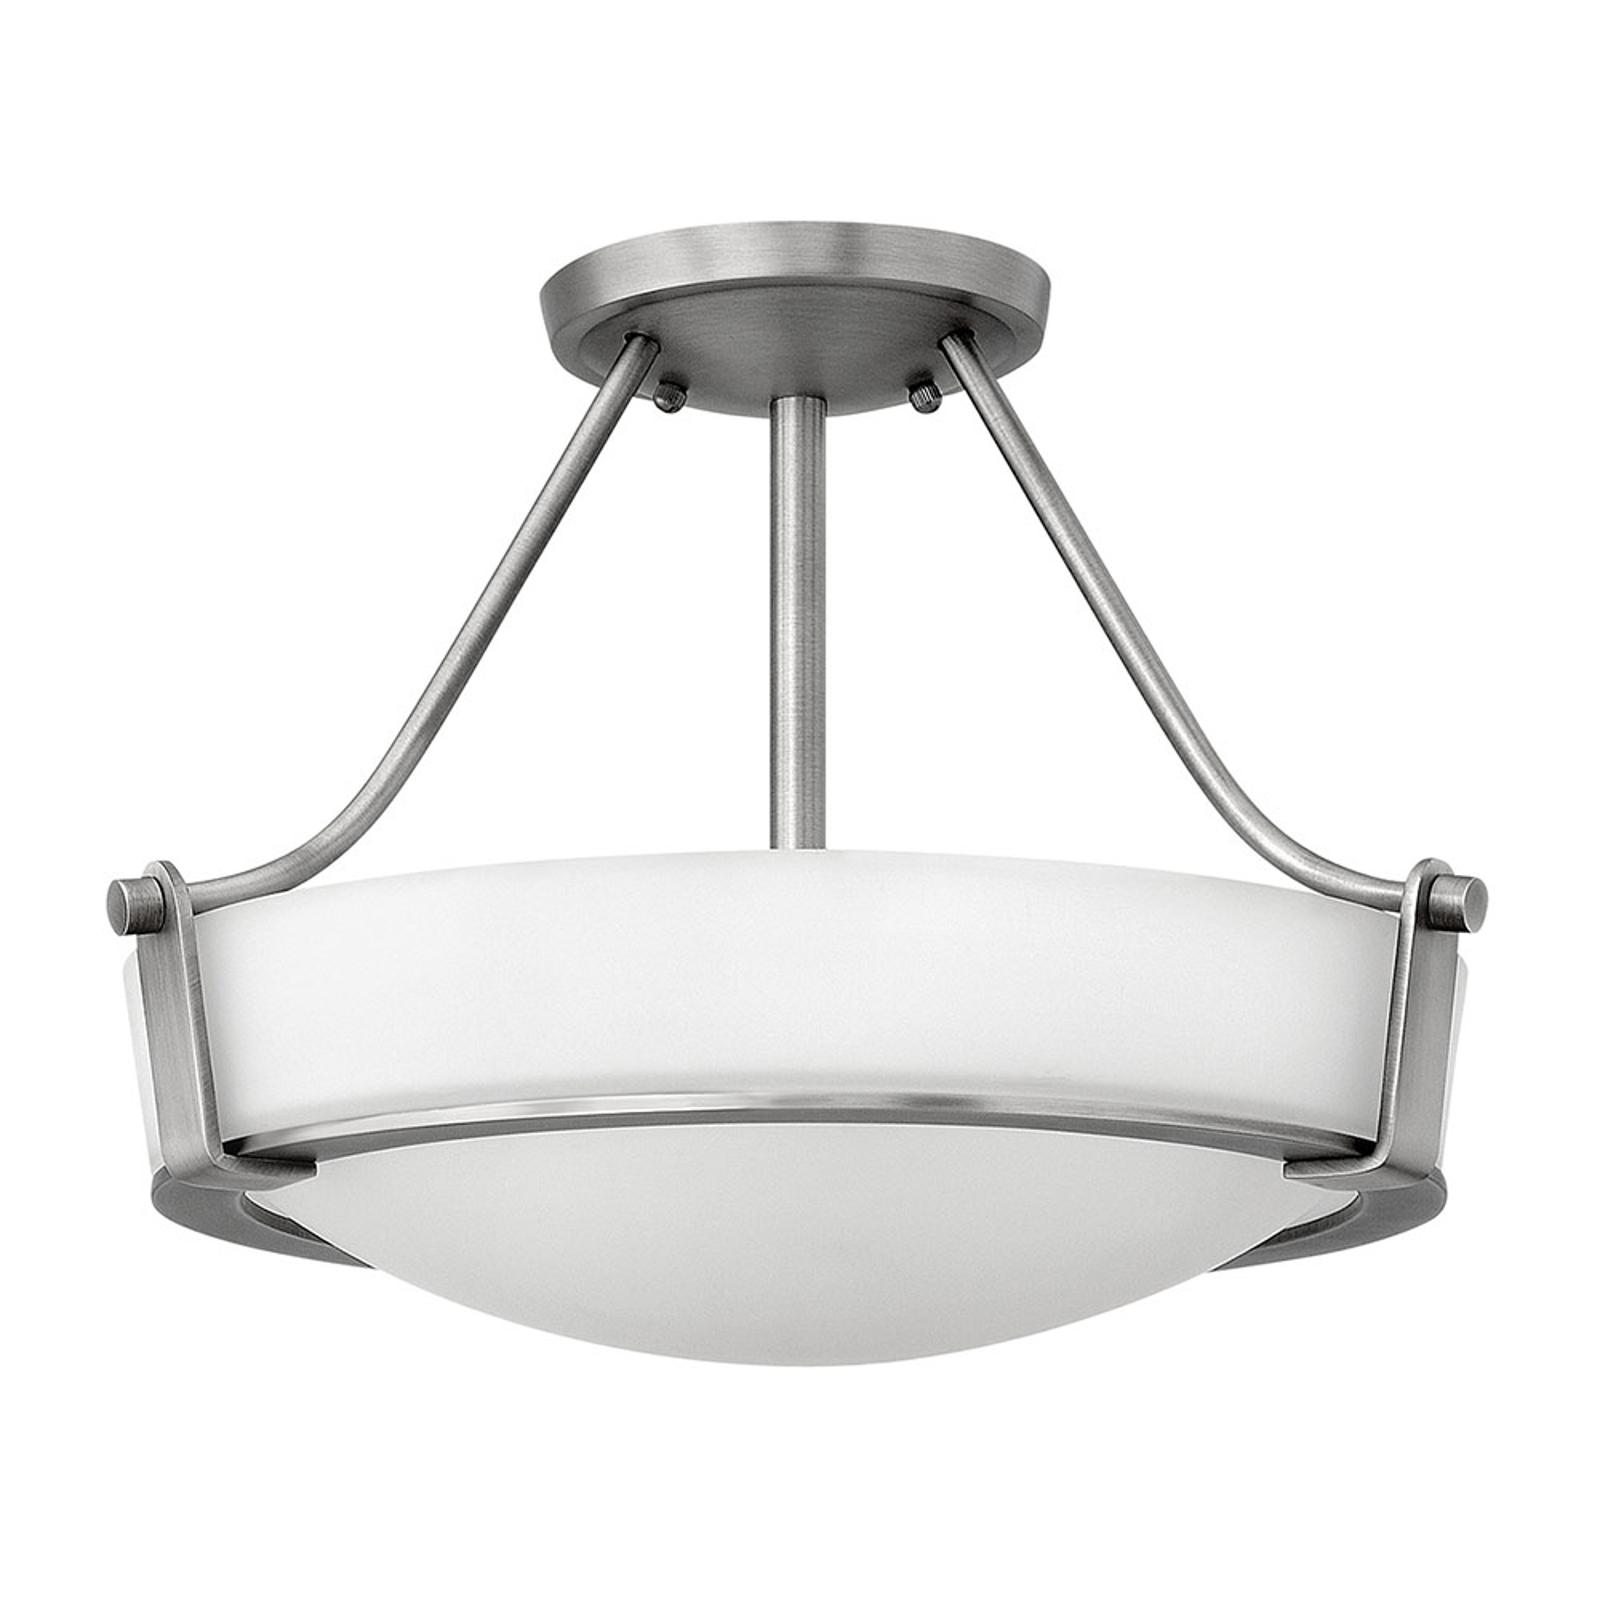 Plafondlamp Hathaway met afstand, nikkel Ø 41 cm